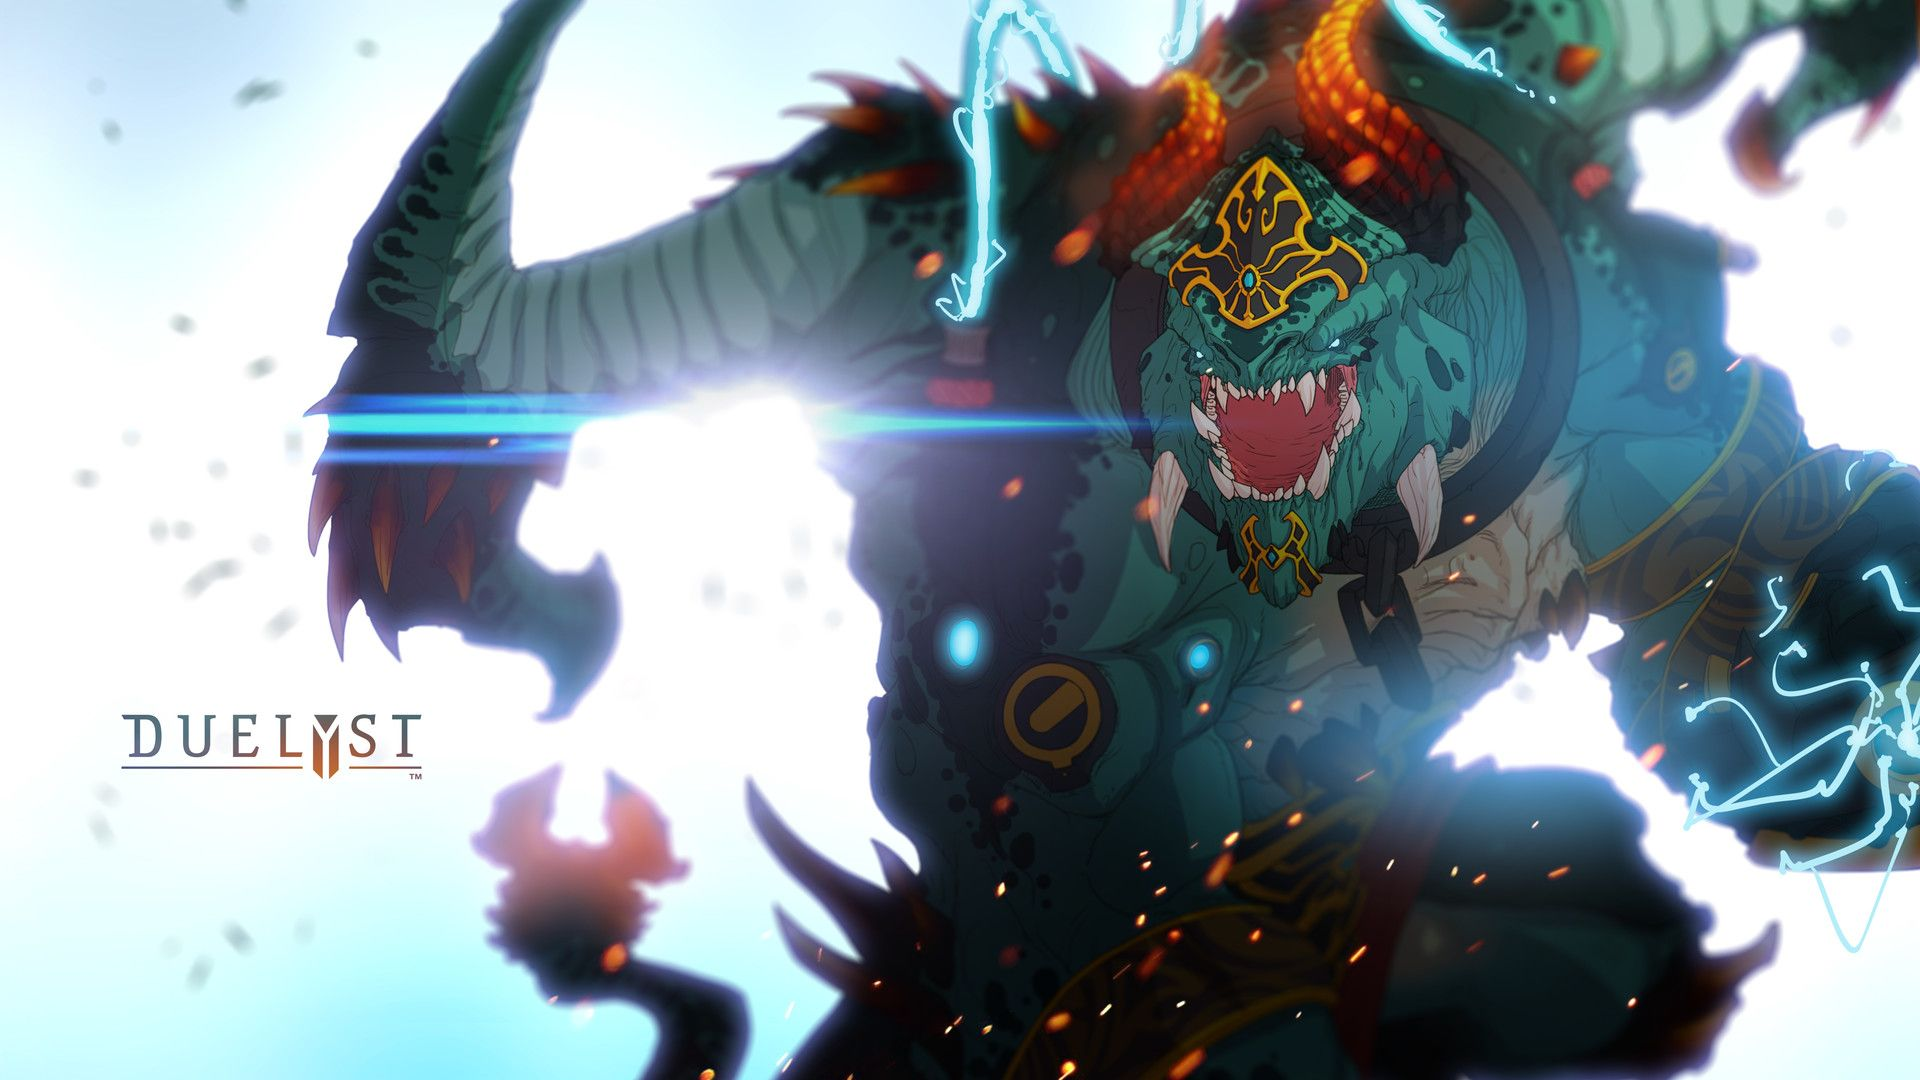 ArtStation DUELYST, chris xia War Game inspiration in